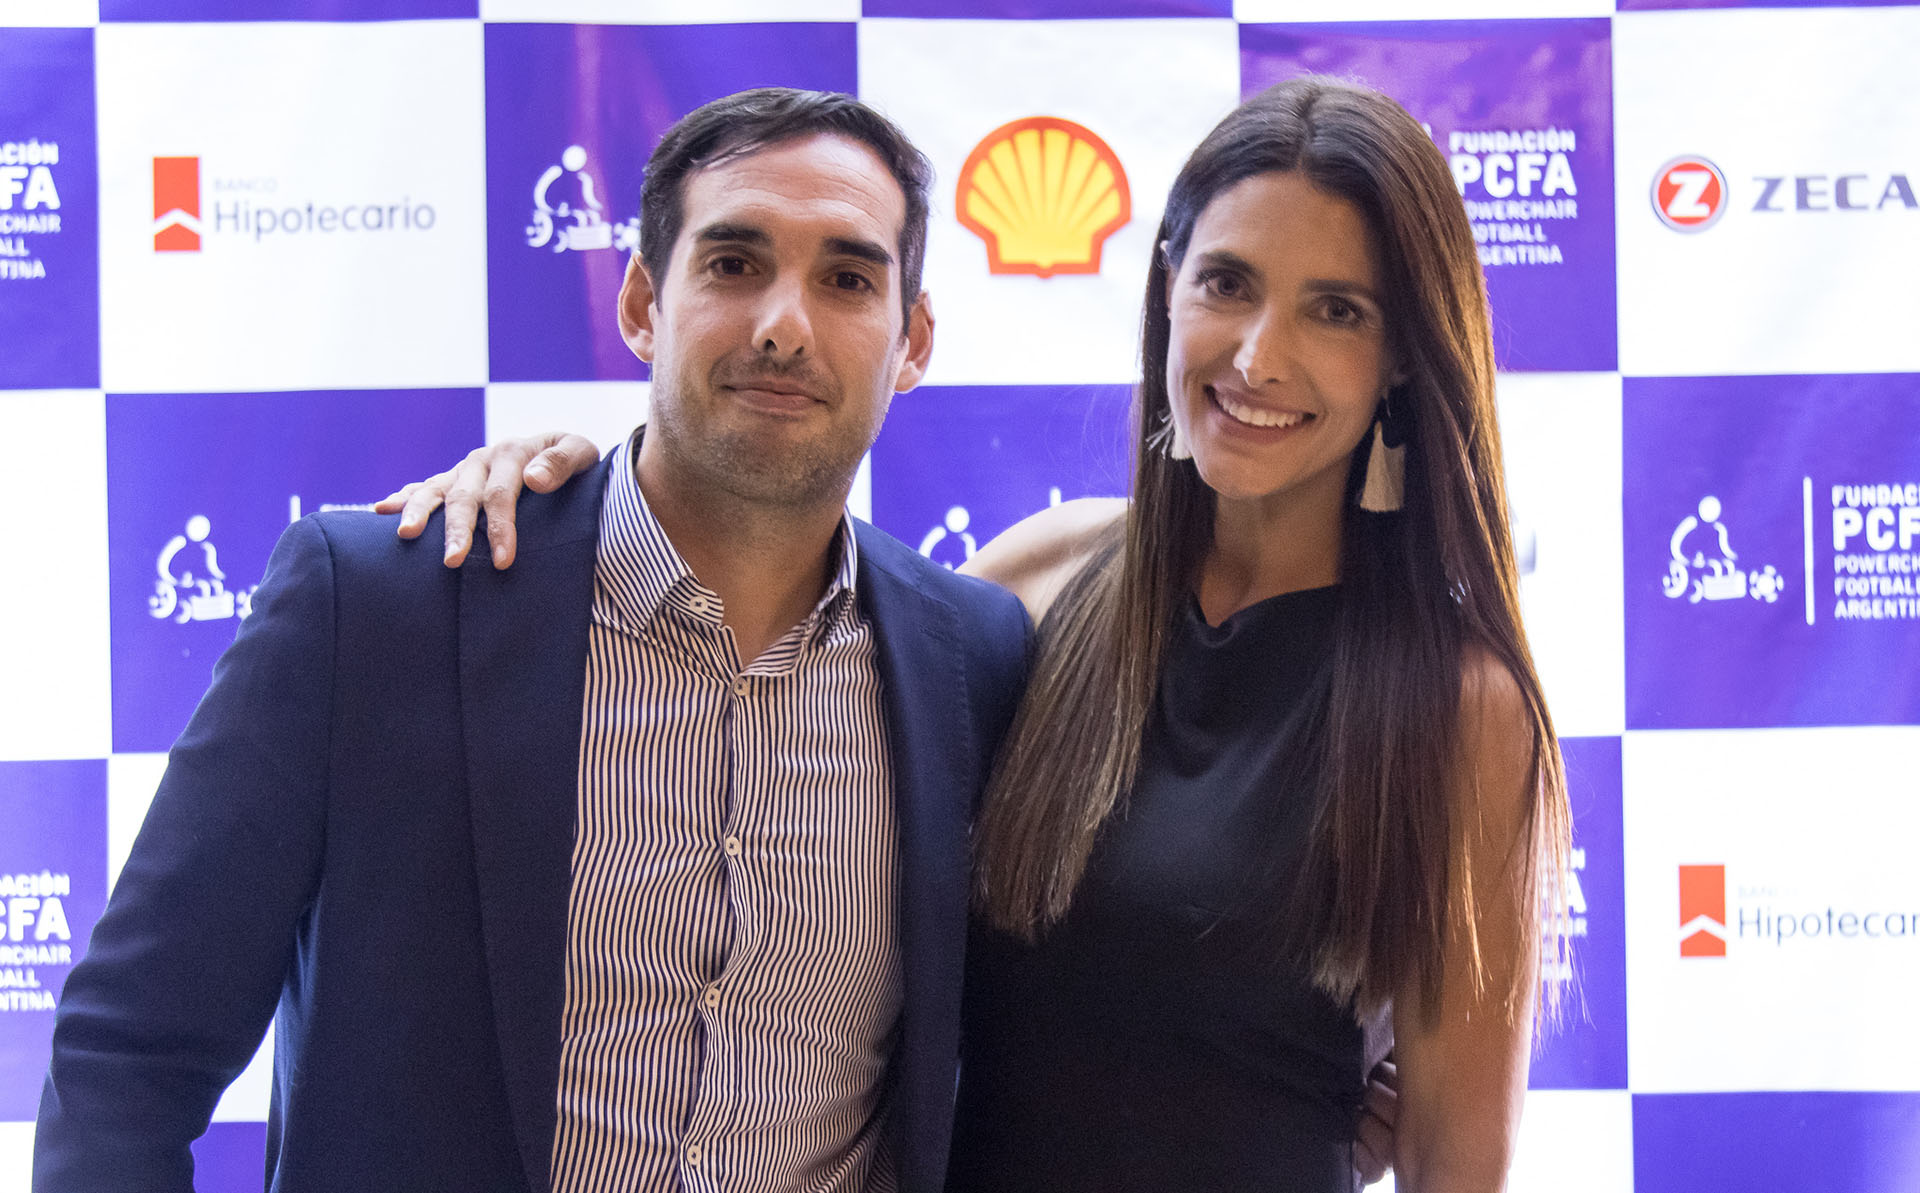 Pablo González y Alejandra Martínez /// Fotos: GentilezaFundación Powerchair Football Argentina